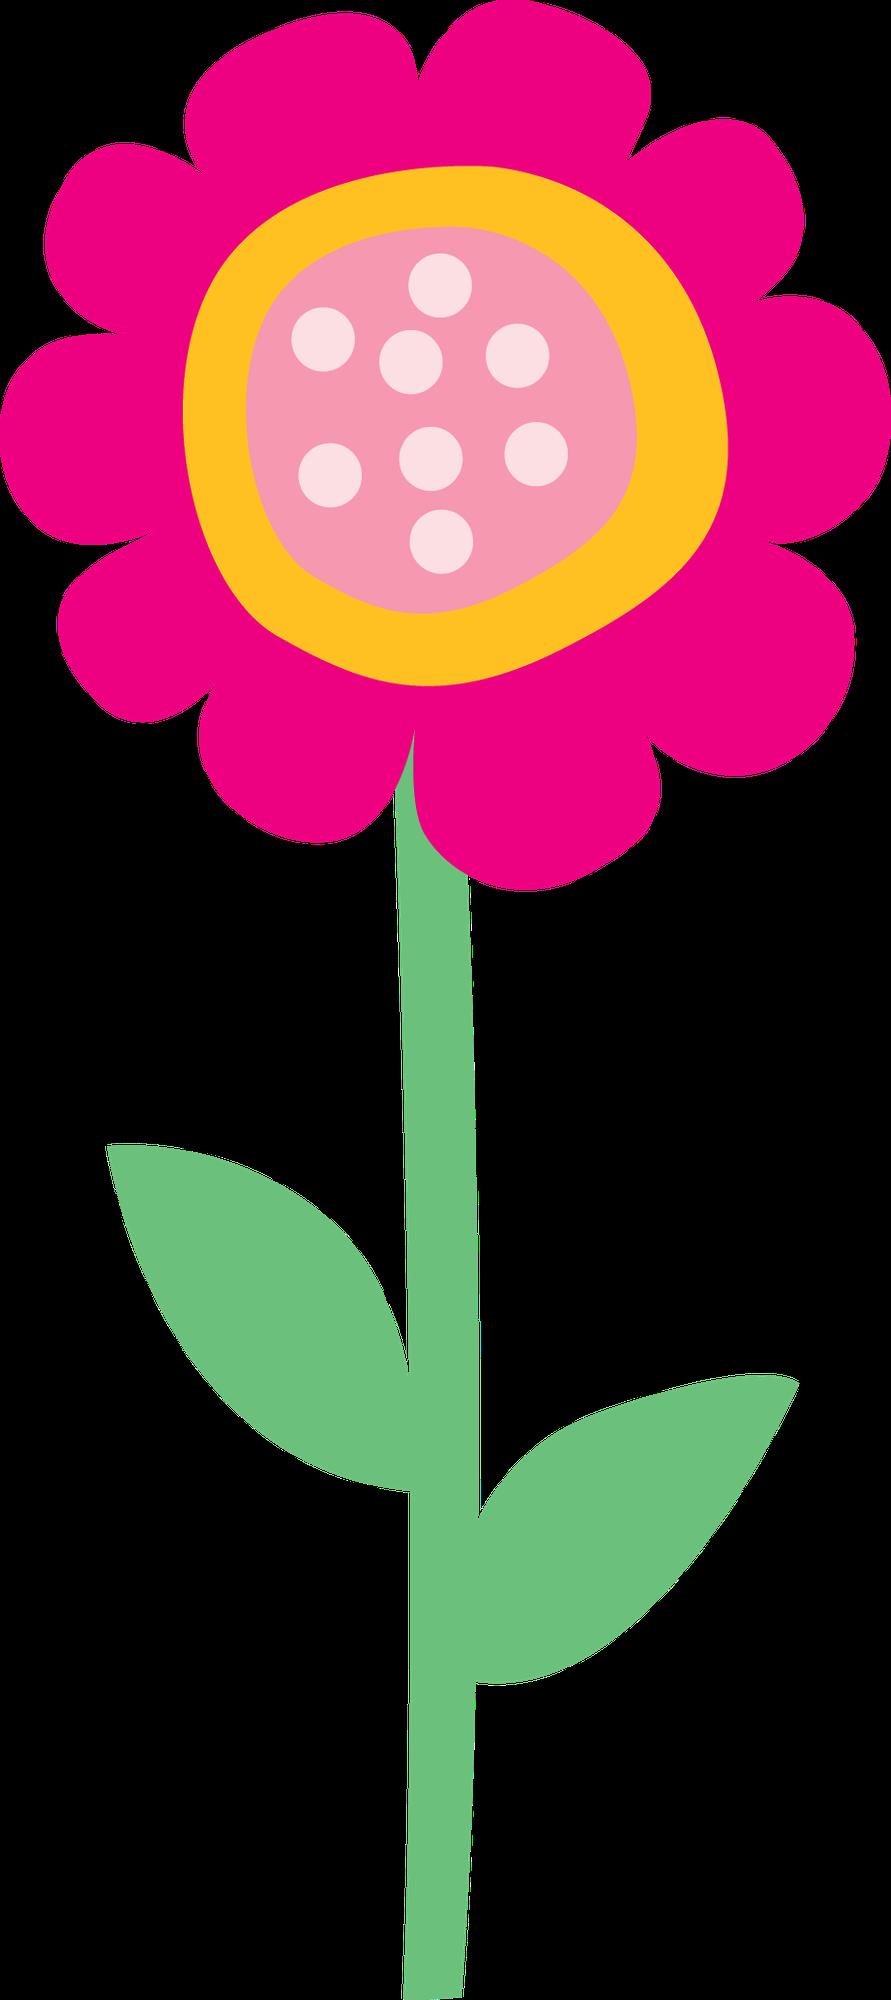 Peppa pig house clipart jpg royalty free download Peppa - Minus | Peppa Pig | Pinterest | Clip art, Flower and Silhouettes jpg royalty free download